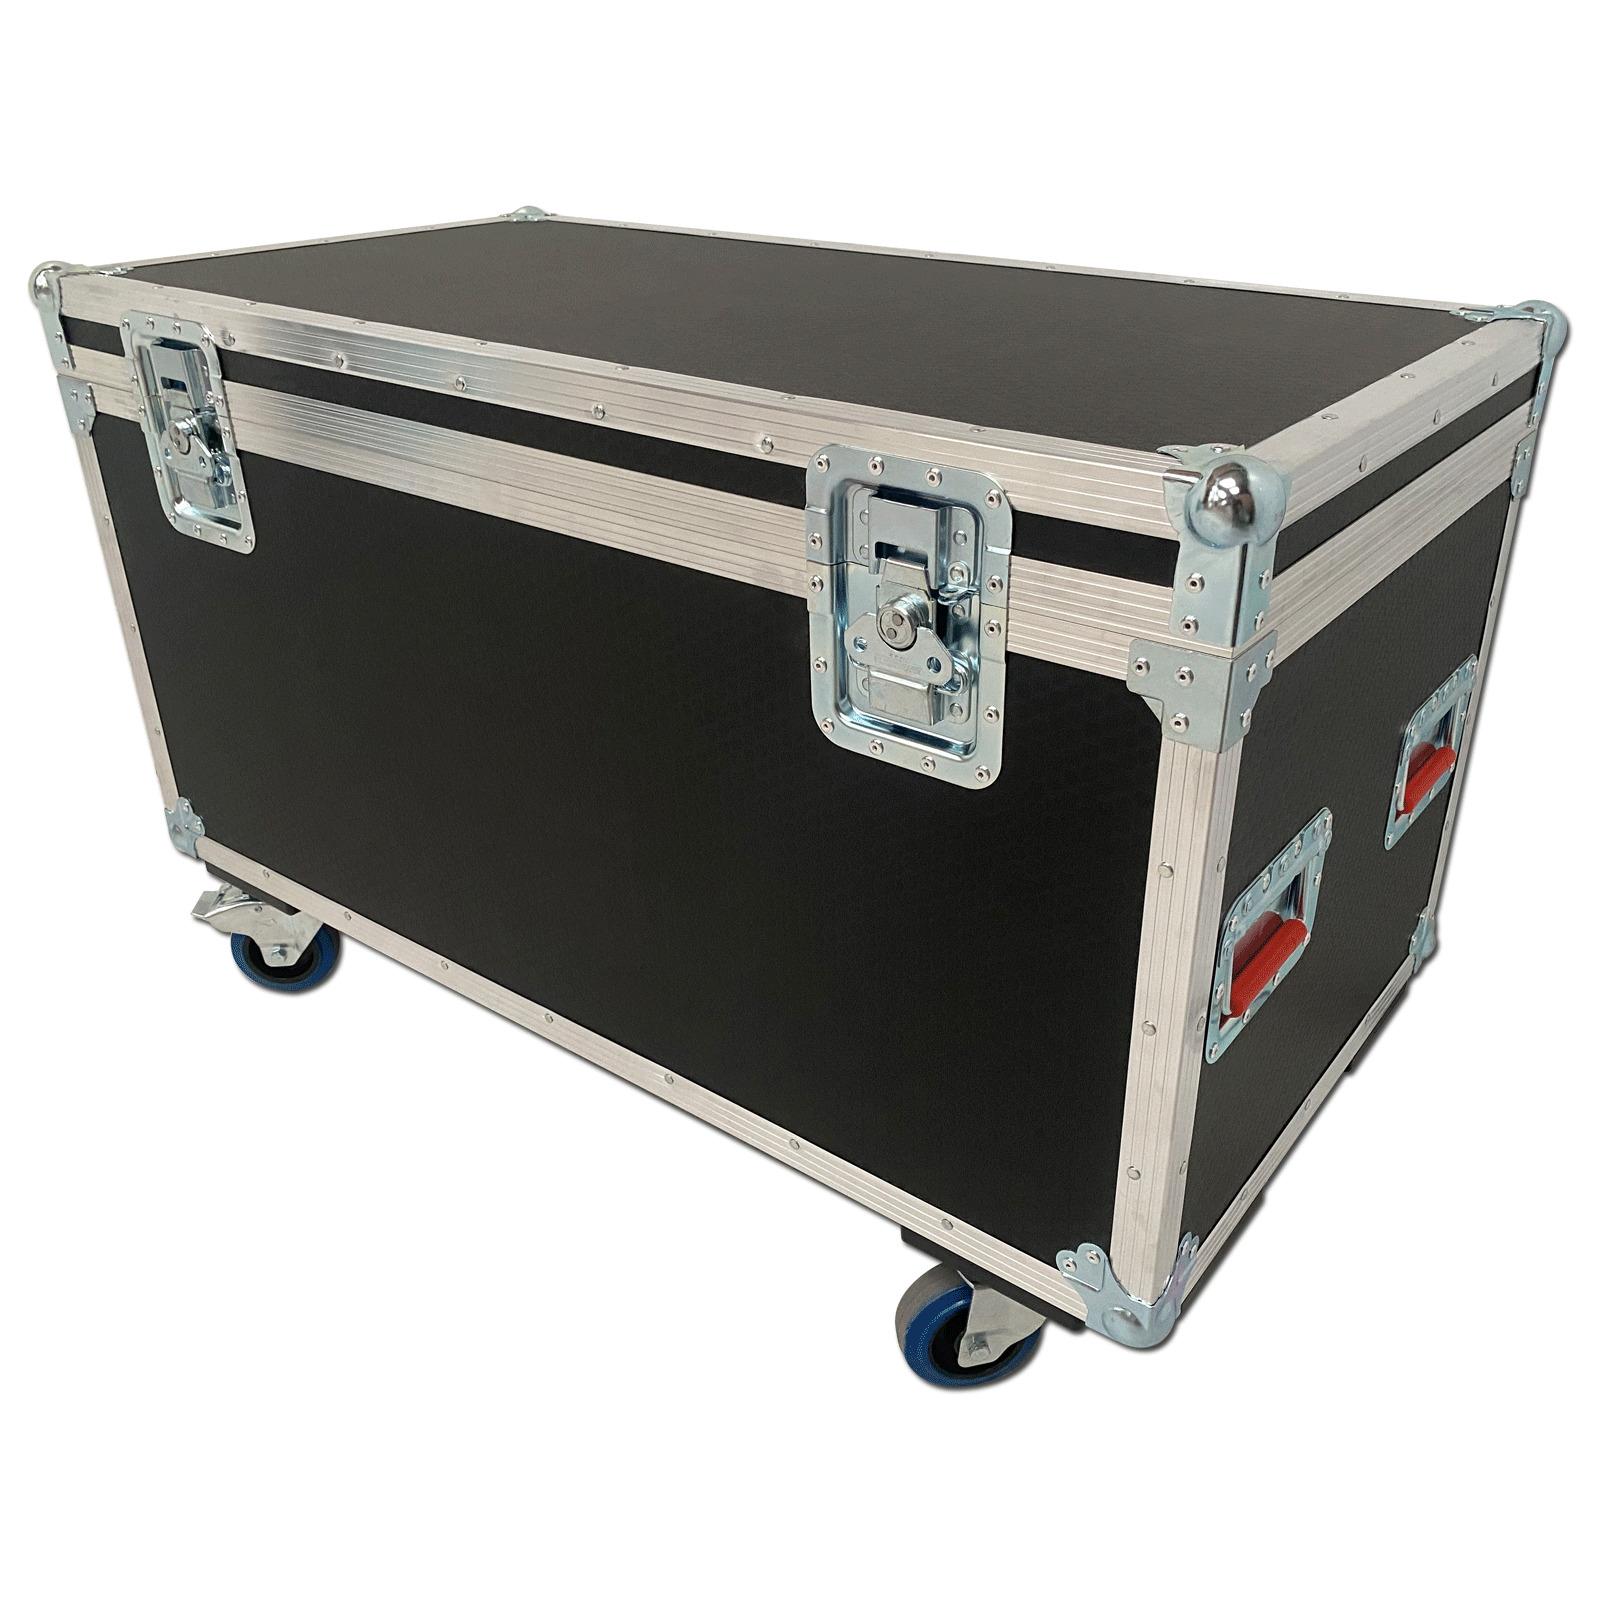 costume storage flight case 1000 x 500 x 500. Black Bedroom Furniture Sets. Home Design Ideas